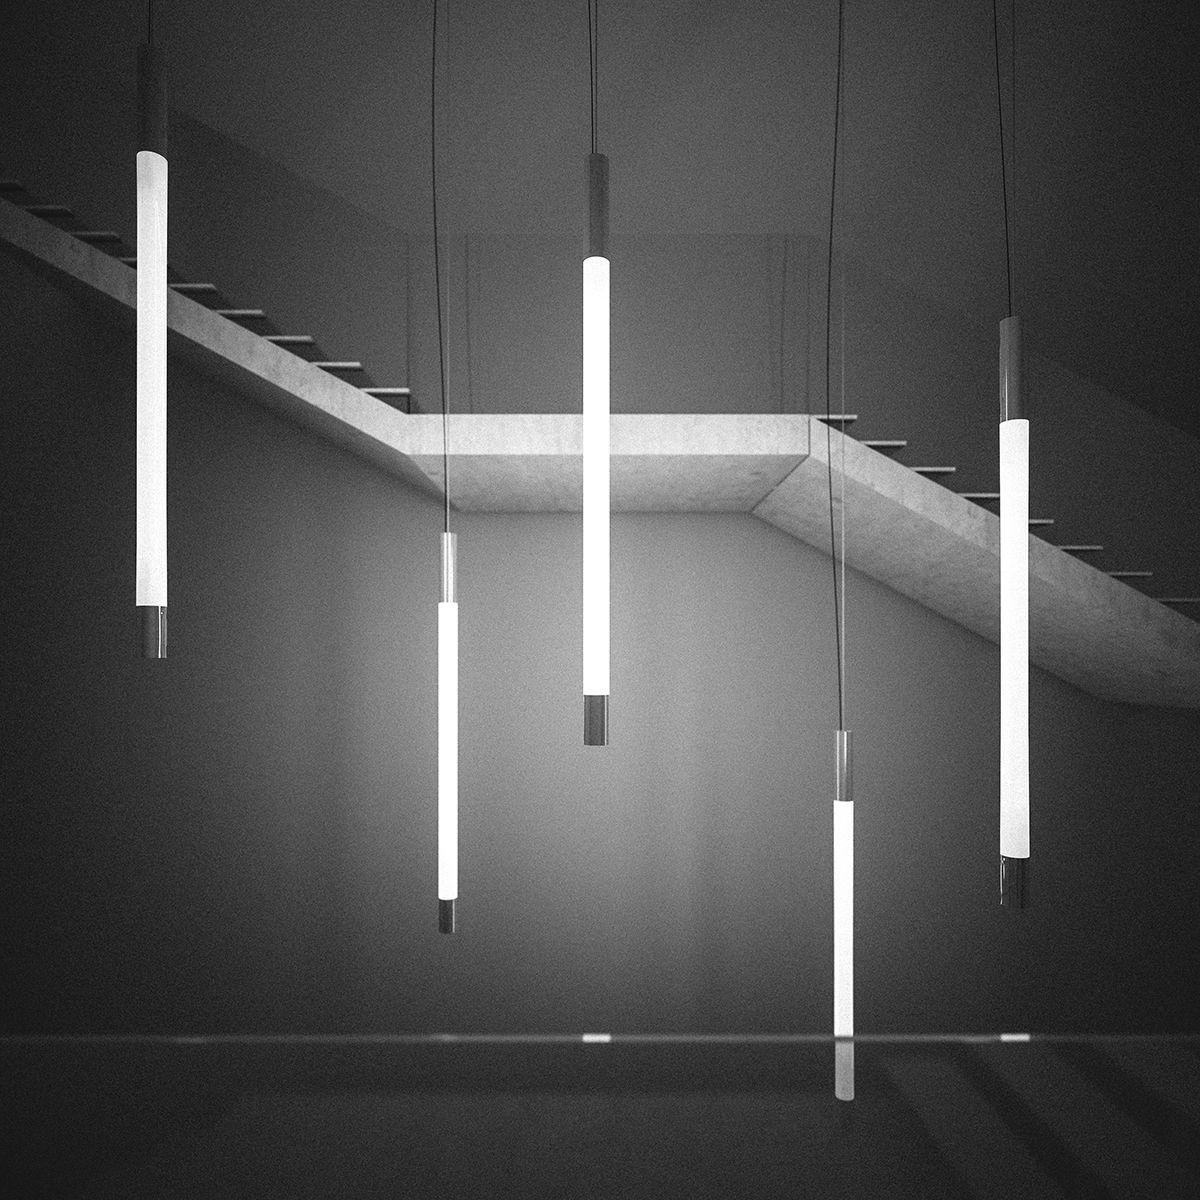 BUCK tube down led | verlichting | Pinterest - Verlichting